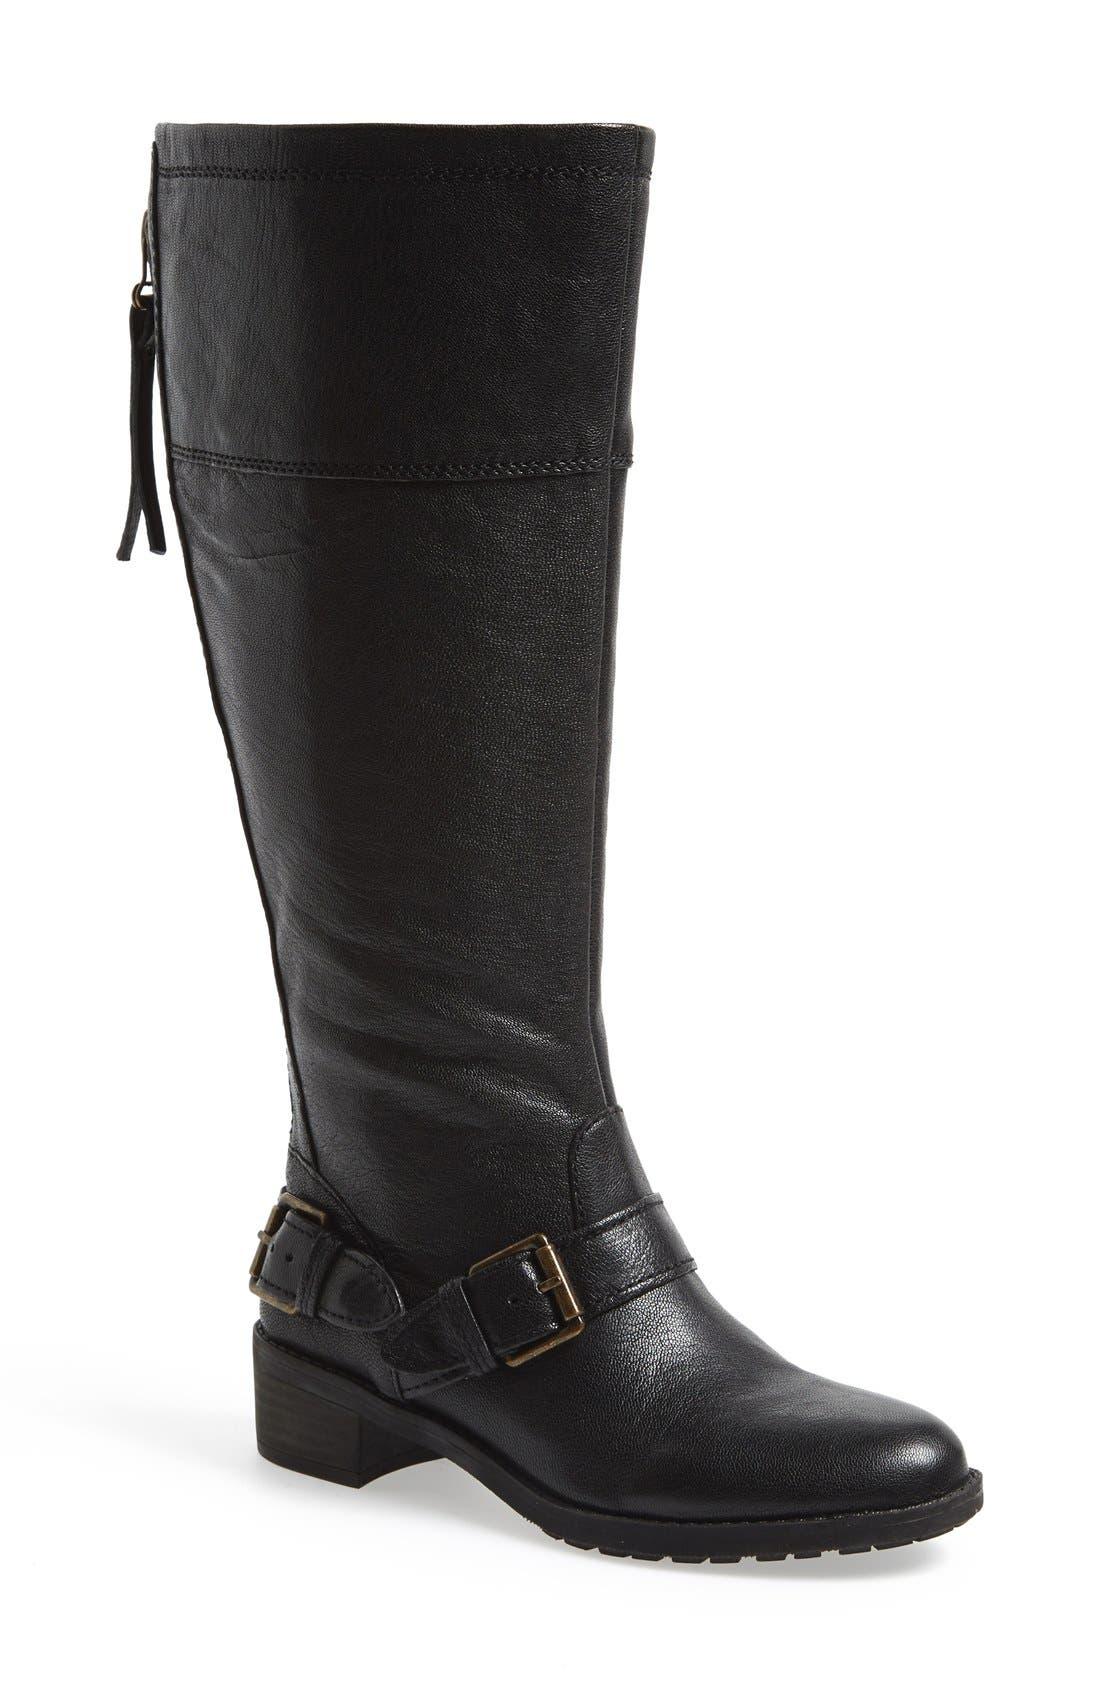 Main Image - Naturalizer 'Macnair' Riding Boot (Wide Calf) (Women)